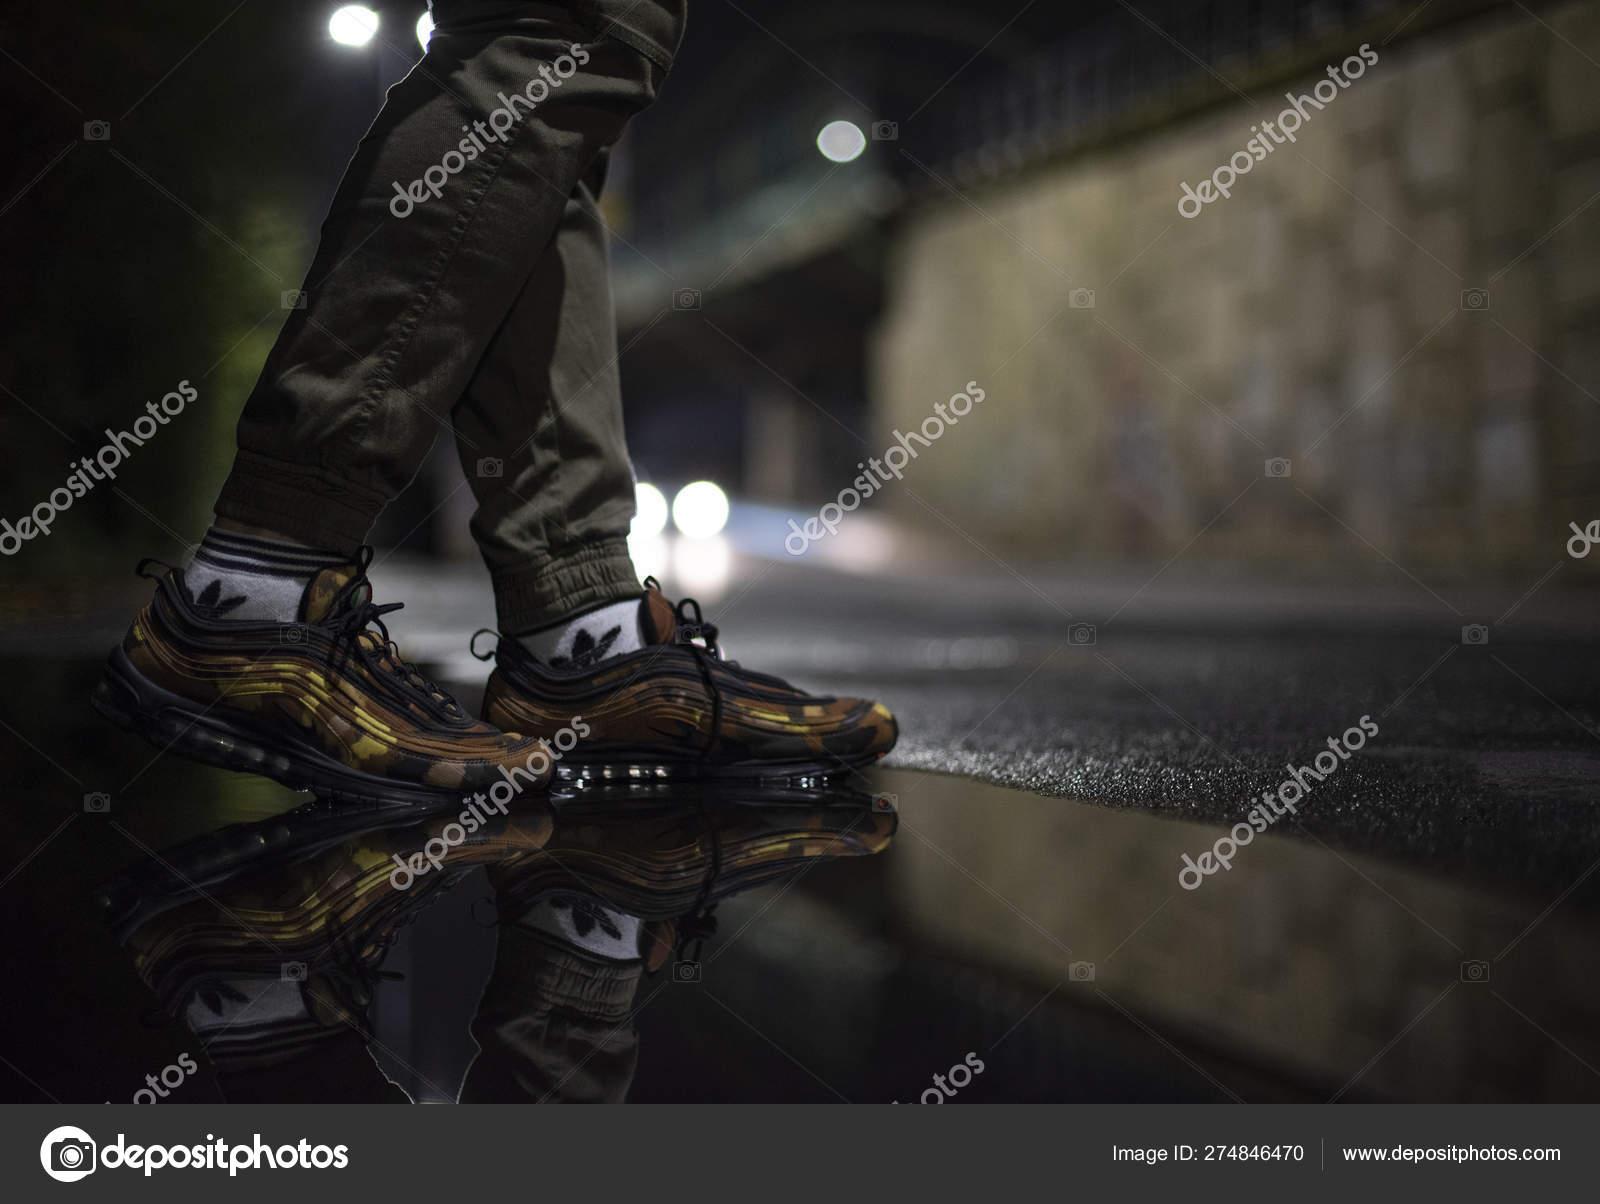 Nike Air Max 97 — Foto editorial de stock © Albo73 #274846470